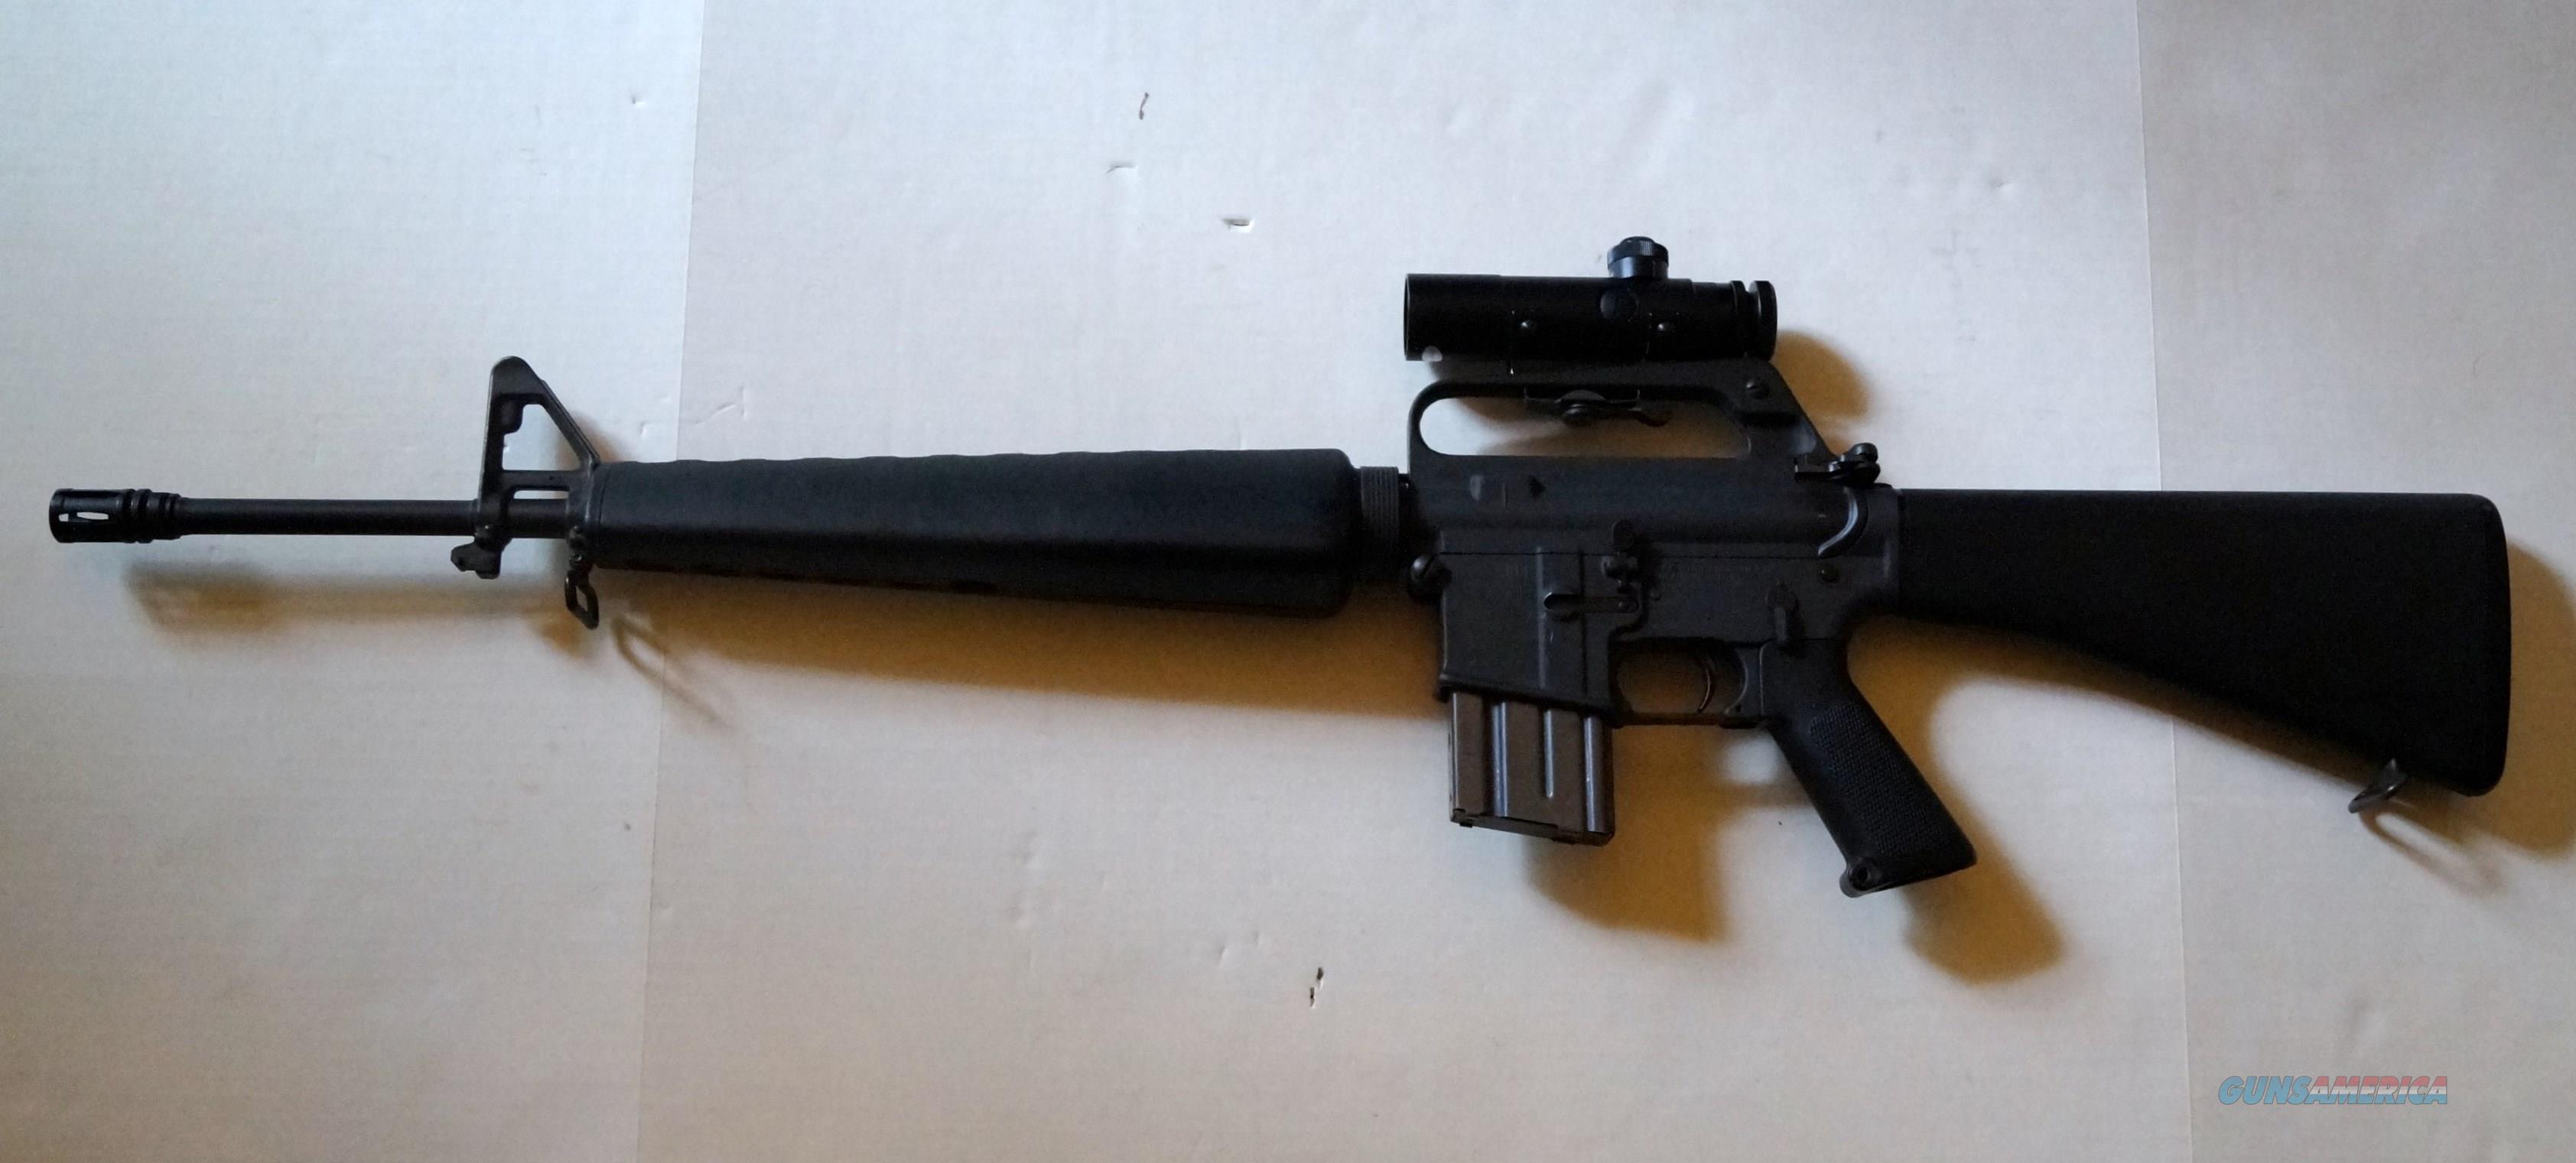 COLT SP 1 (R6000) WITH COLT SCOPE / AR-15 PRE BAN  Guns > Rifles > Colt Military/Tactical Rifles